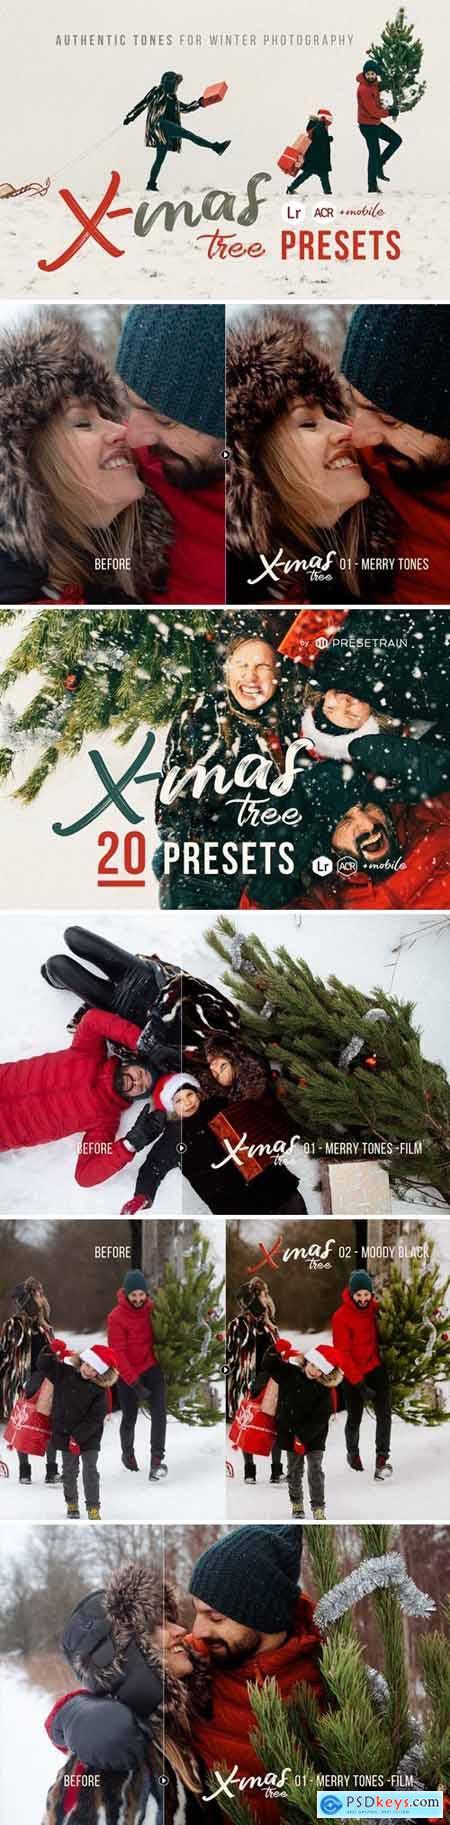 Christmas Tree - 20 Winter Presets 4457878